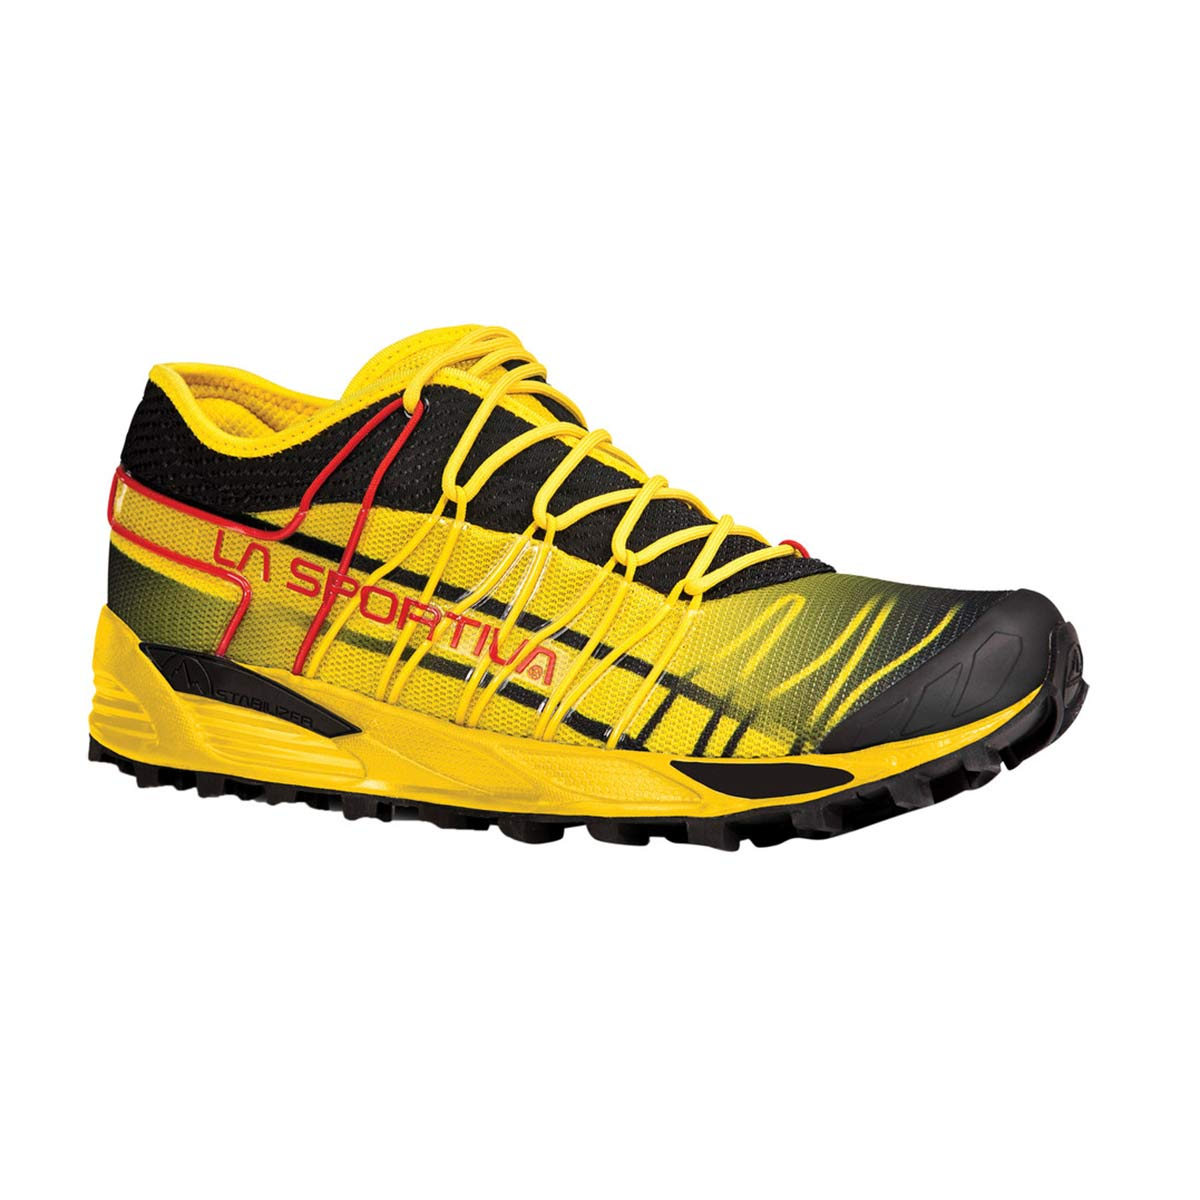 Chaussures De Trail Running Mutant La Sportiva waA2br9